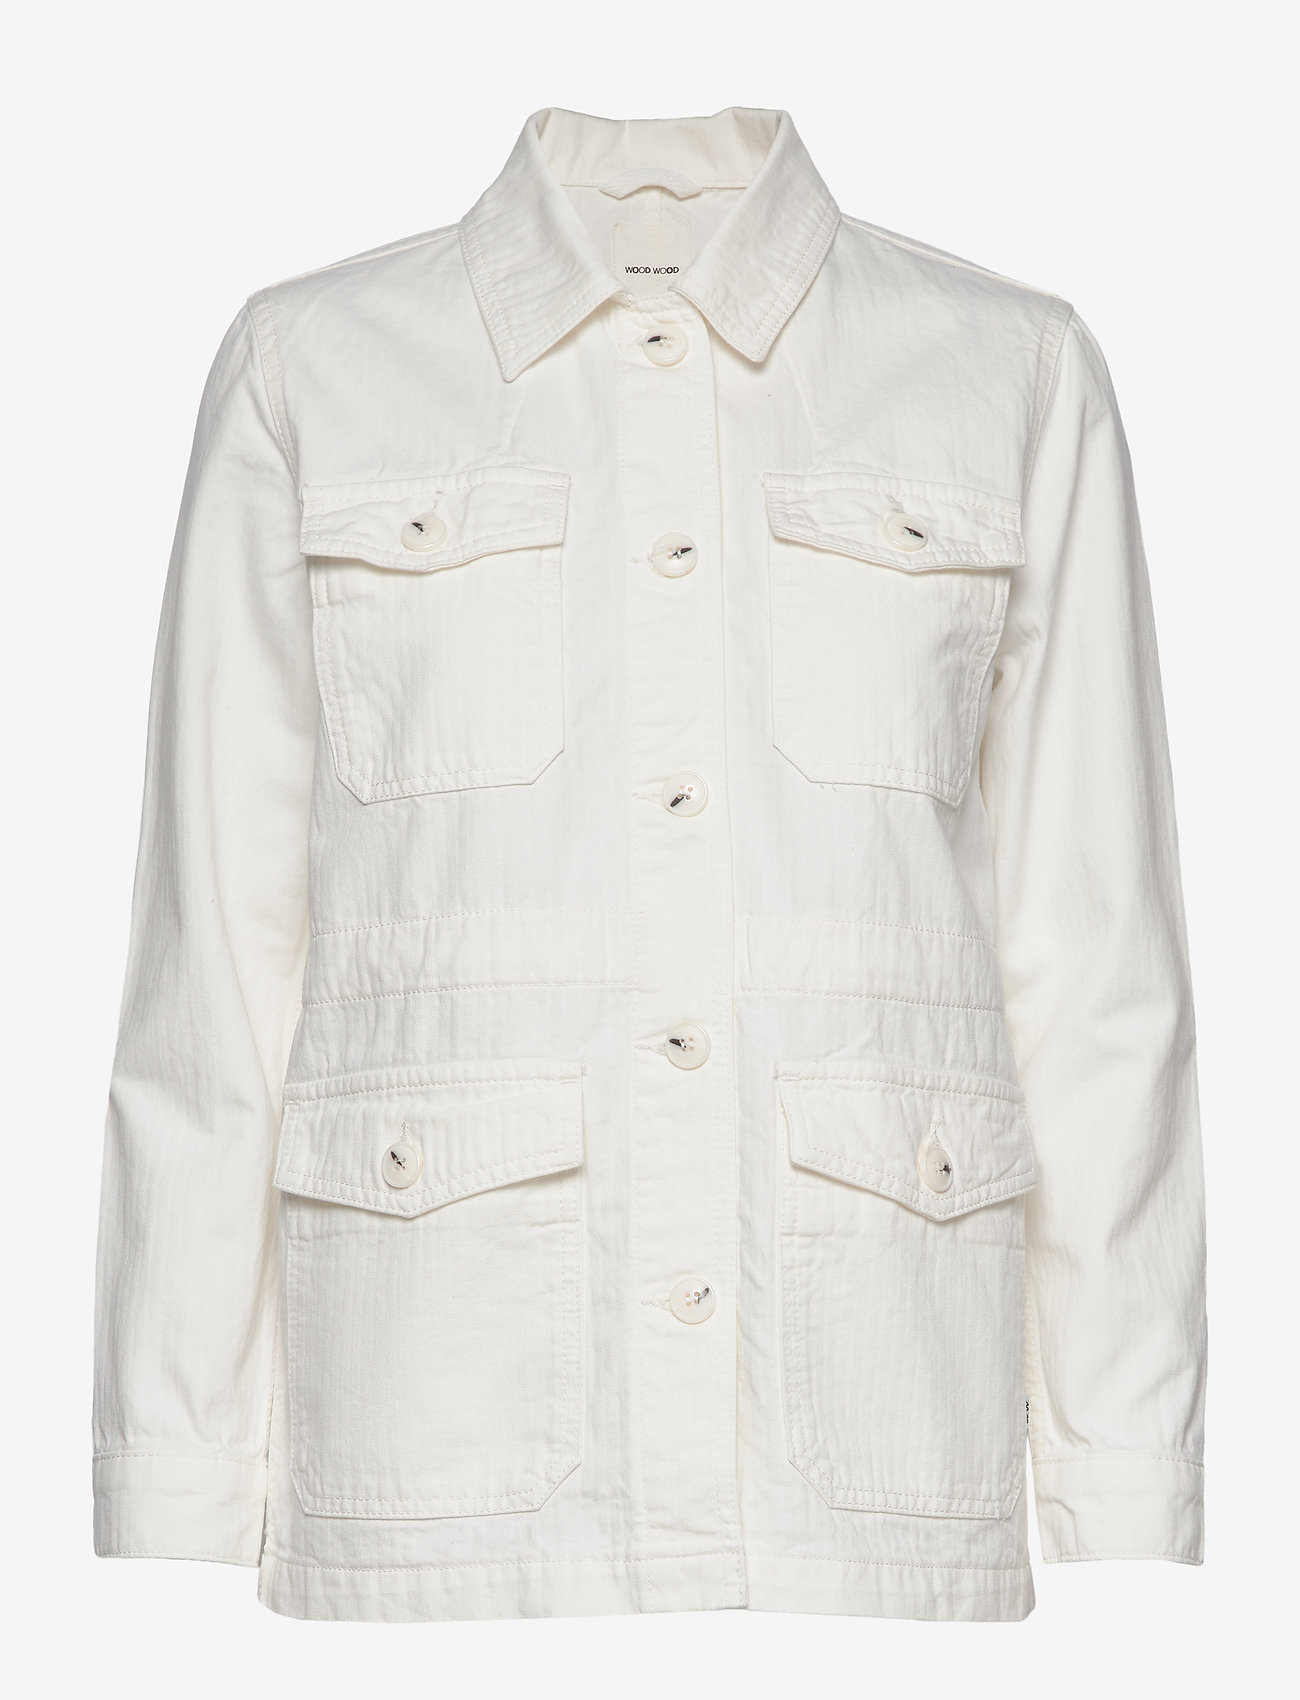 Wood Wood - Gretchen jacket - utility jassen - off-white - 1